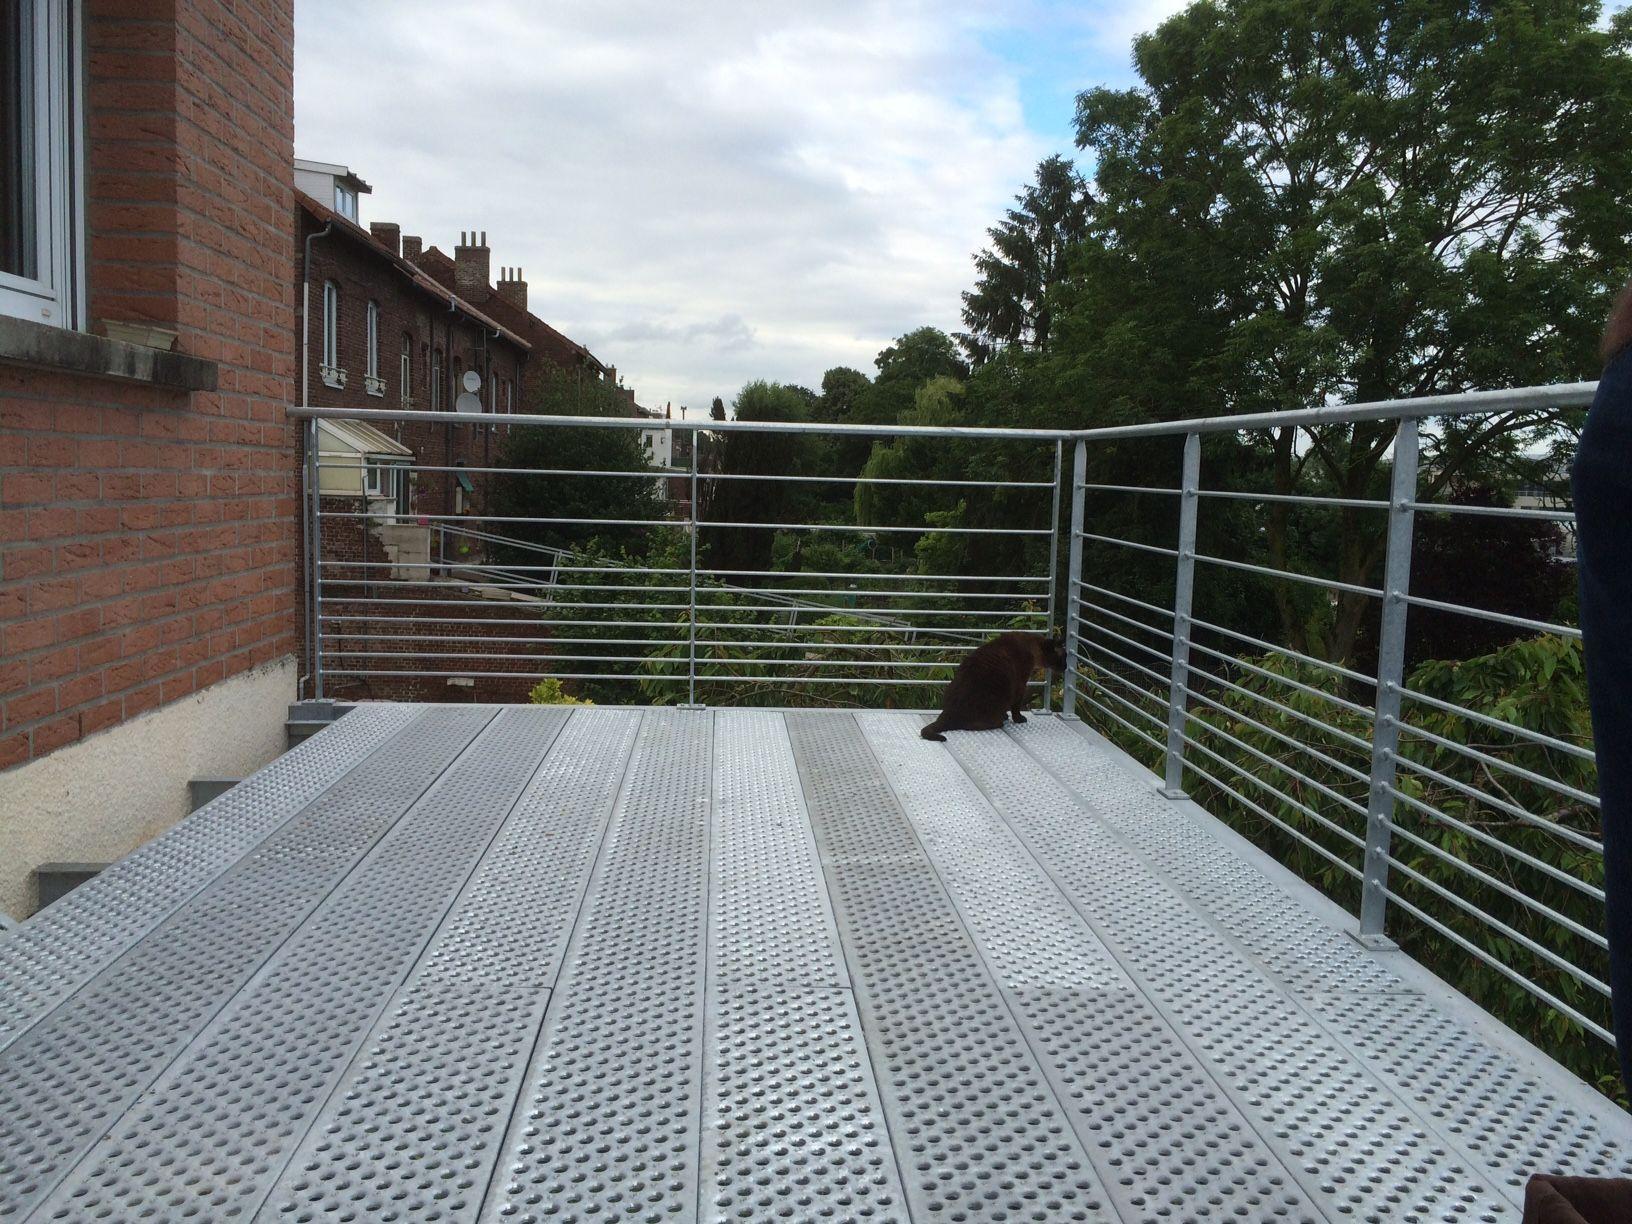 terrasse suspendue cool terrasse suspendue sur pilotis terrasse socobois with terrasse. Black Bedroom Furniture Sets. Home Design Ideas